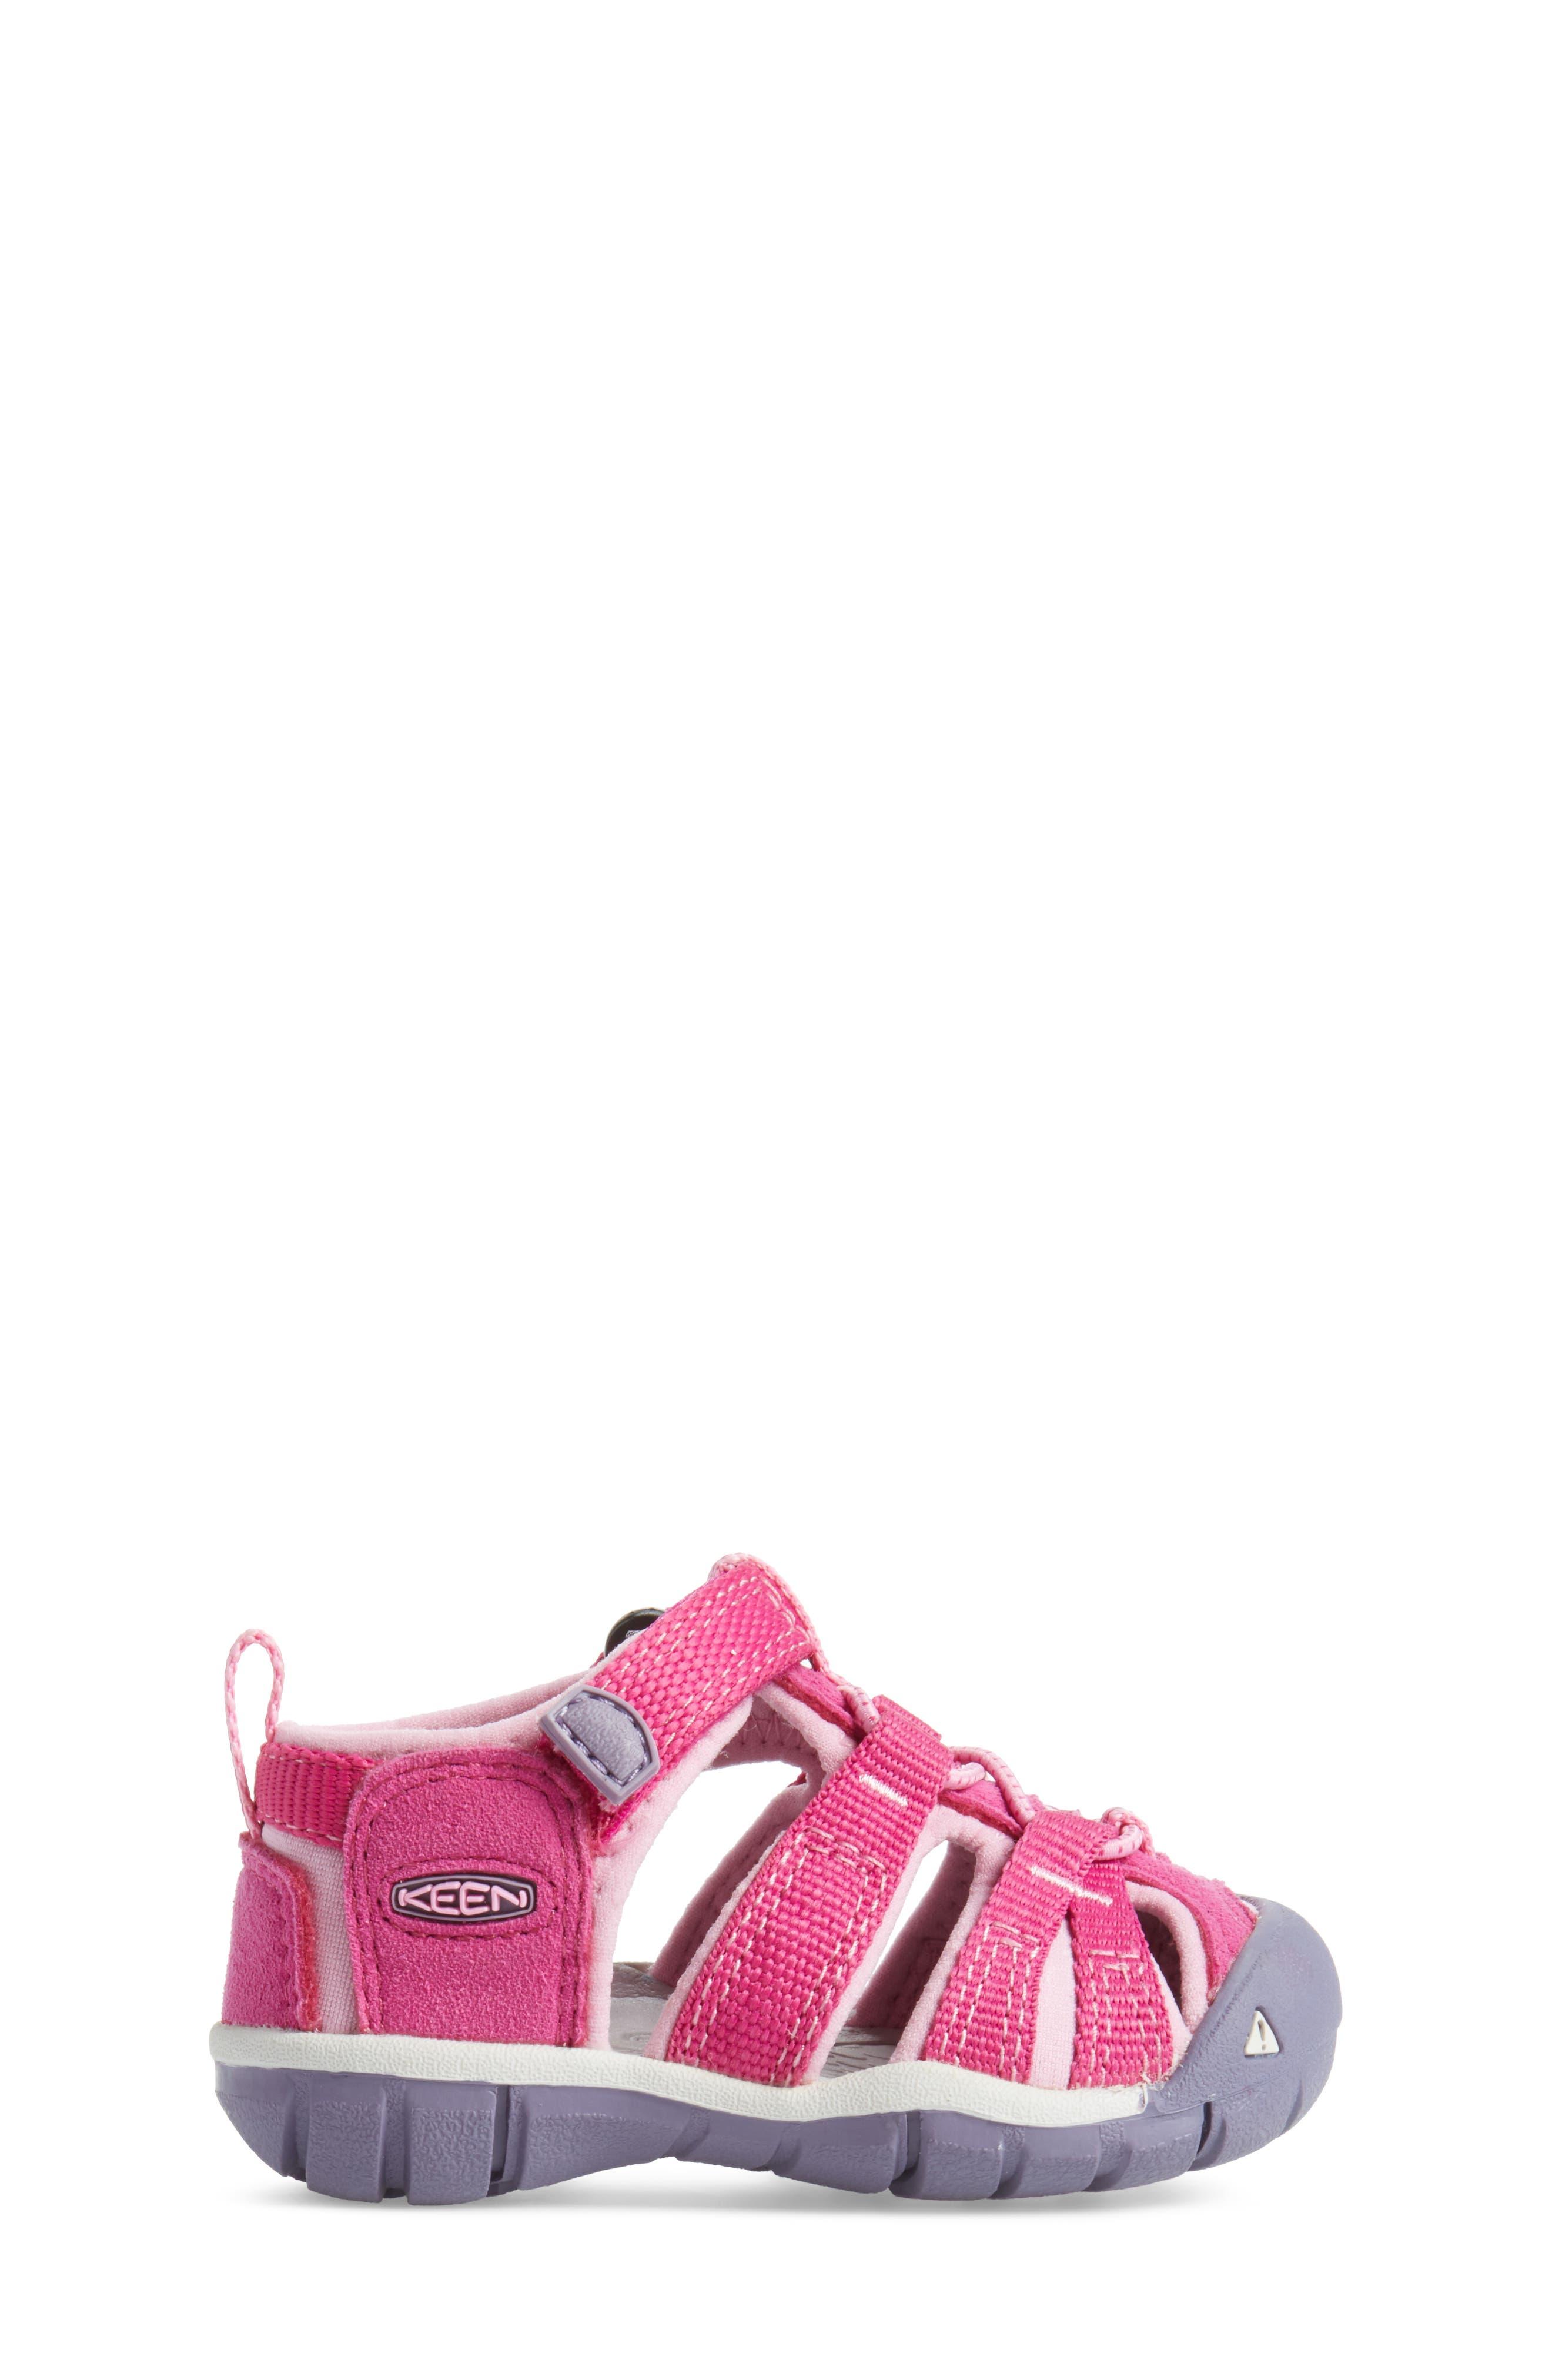 'Seacamp II' Water Friendly Sandal,                             Alternate thumbnail 3, color,                             Very Berry/ Lilac Chiffon